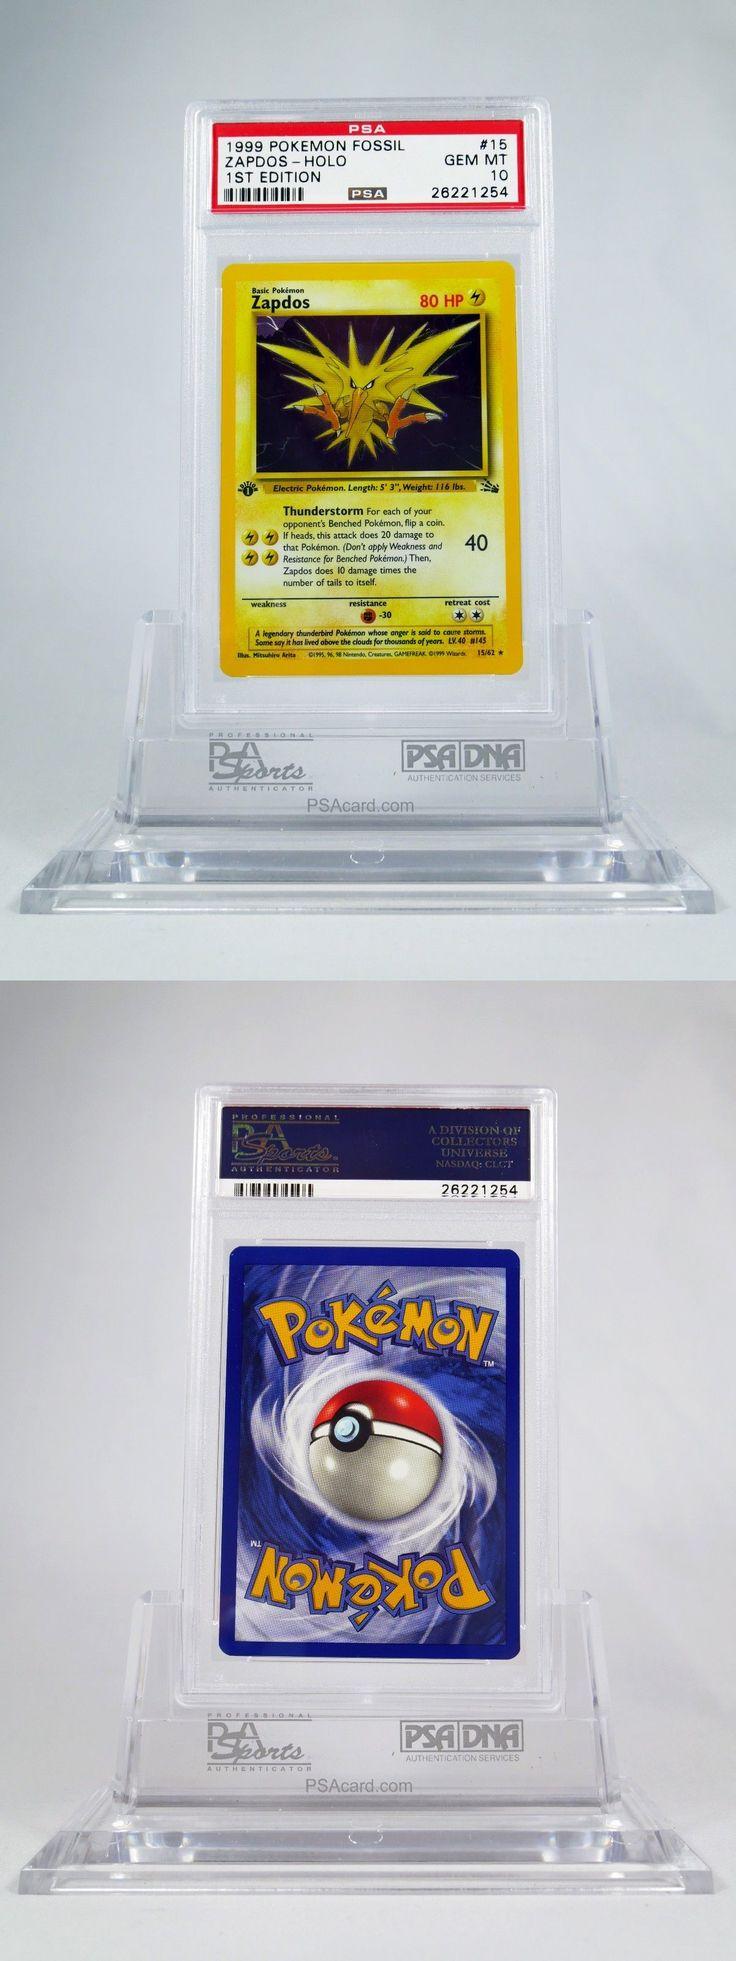 Pok mon Individual Cards 2611: Psa 10 Gem Mint 1St Edition Holo Zapdos Pokemon Fossil Set #15 62 -> BUY IT NOW ONLY: $224.99 on eBay!